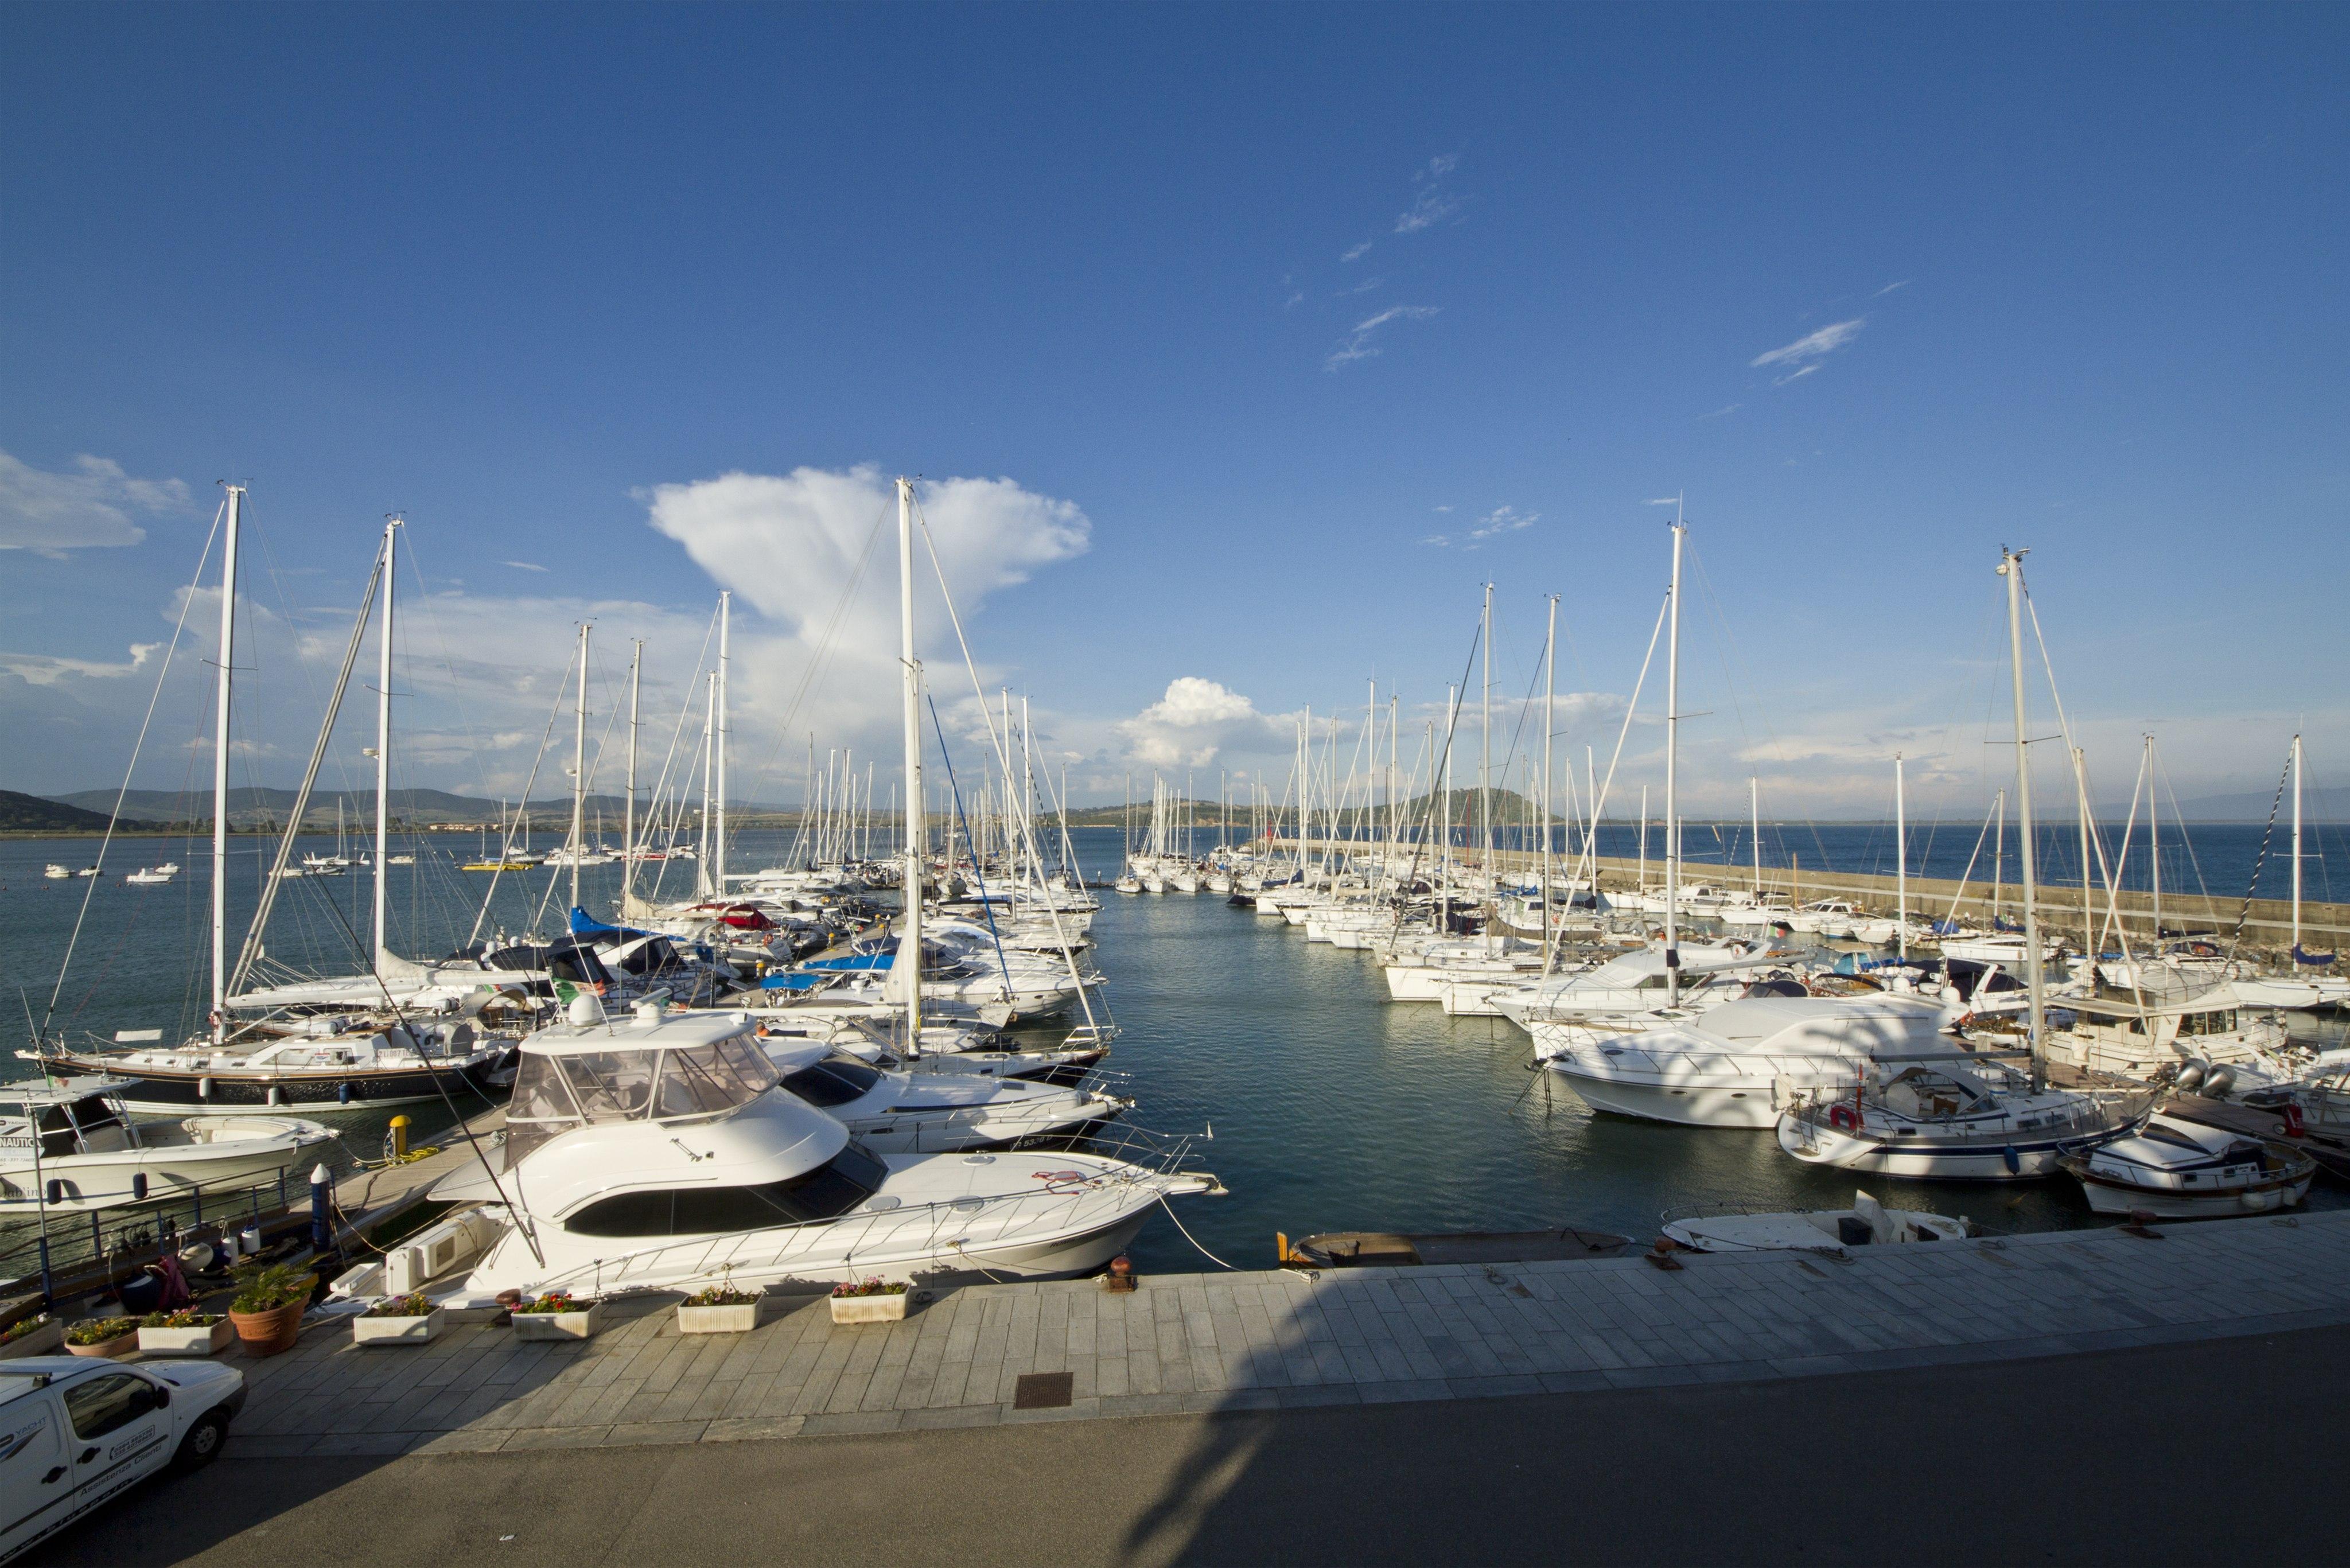 Port di Talamone, Talamone, Grosseto, Italy - panoramio